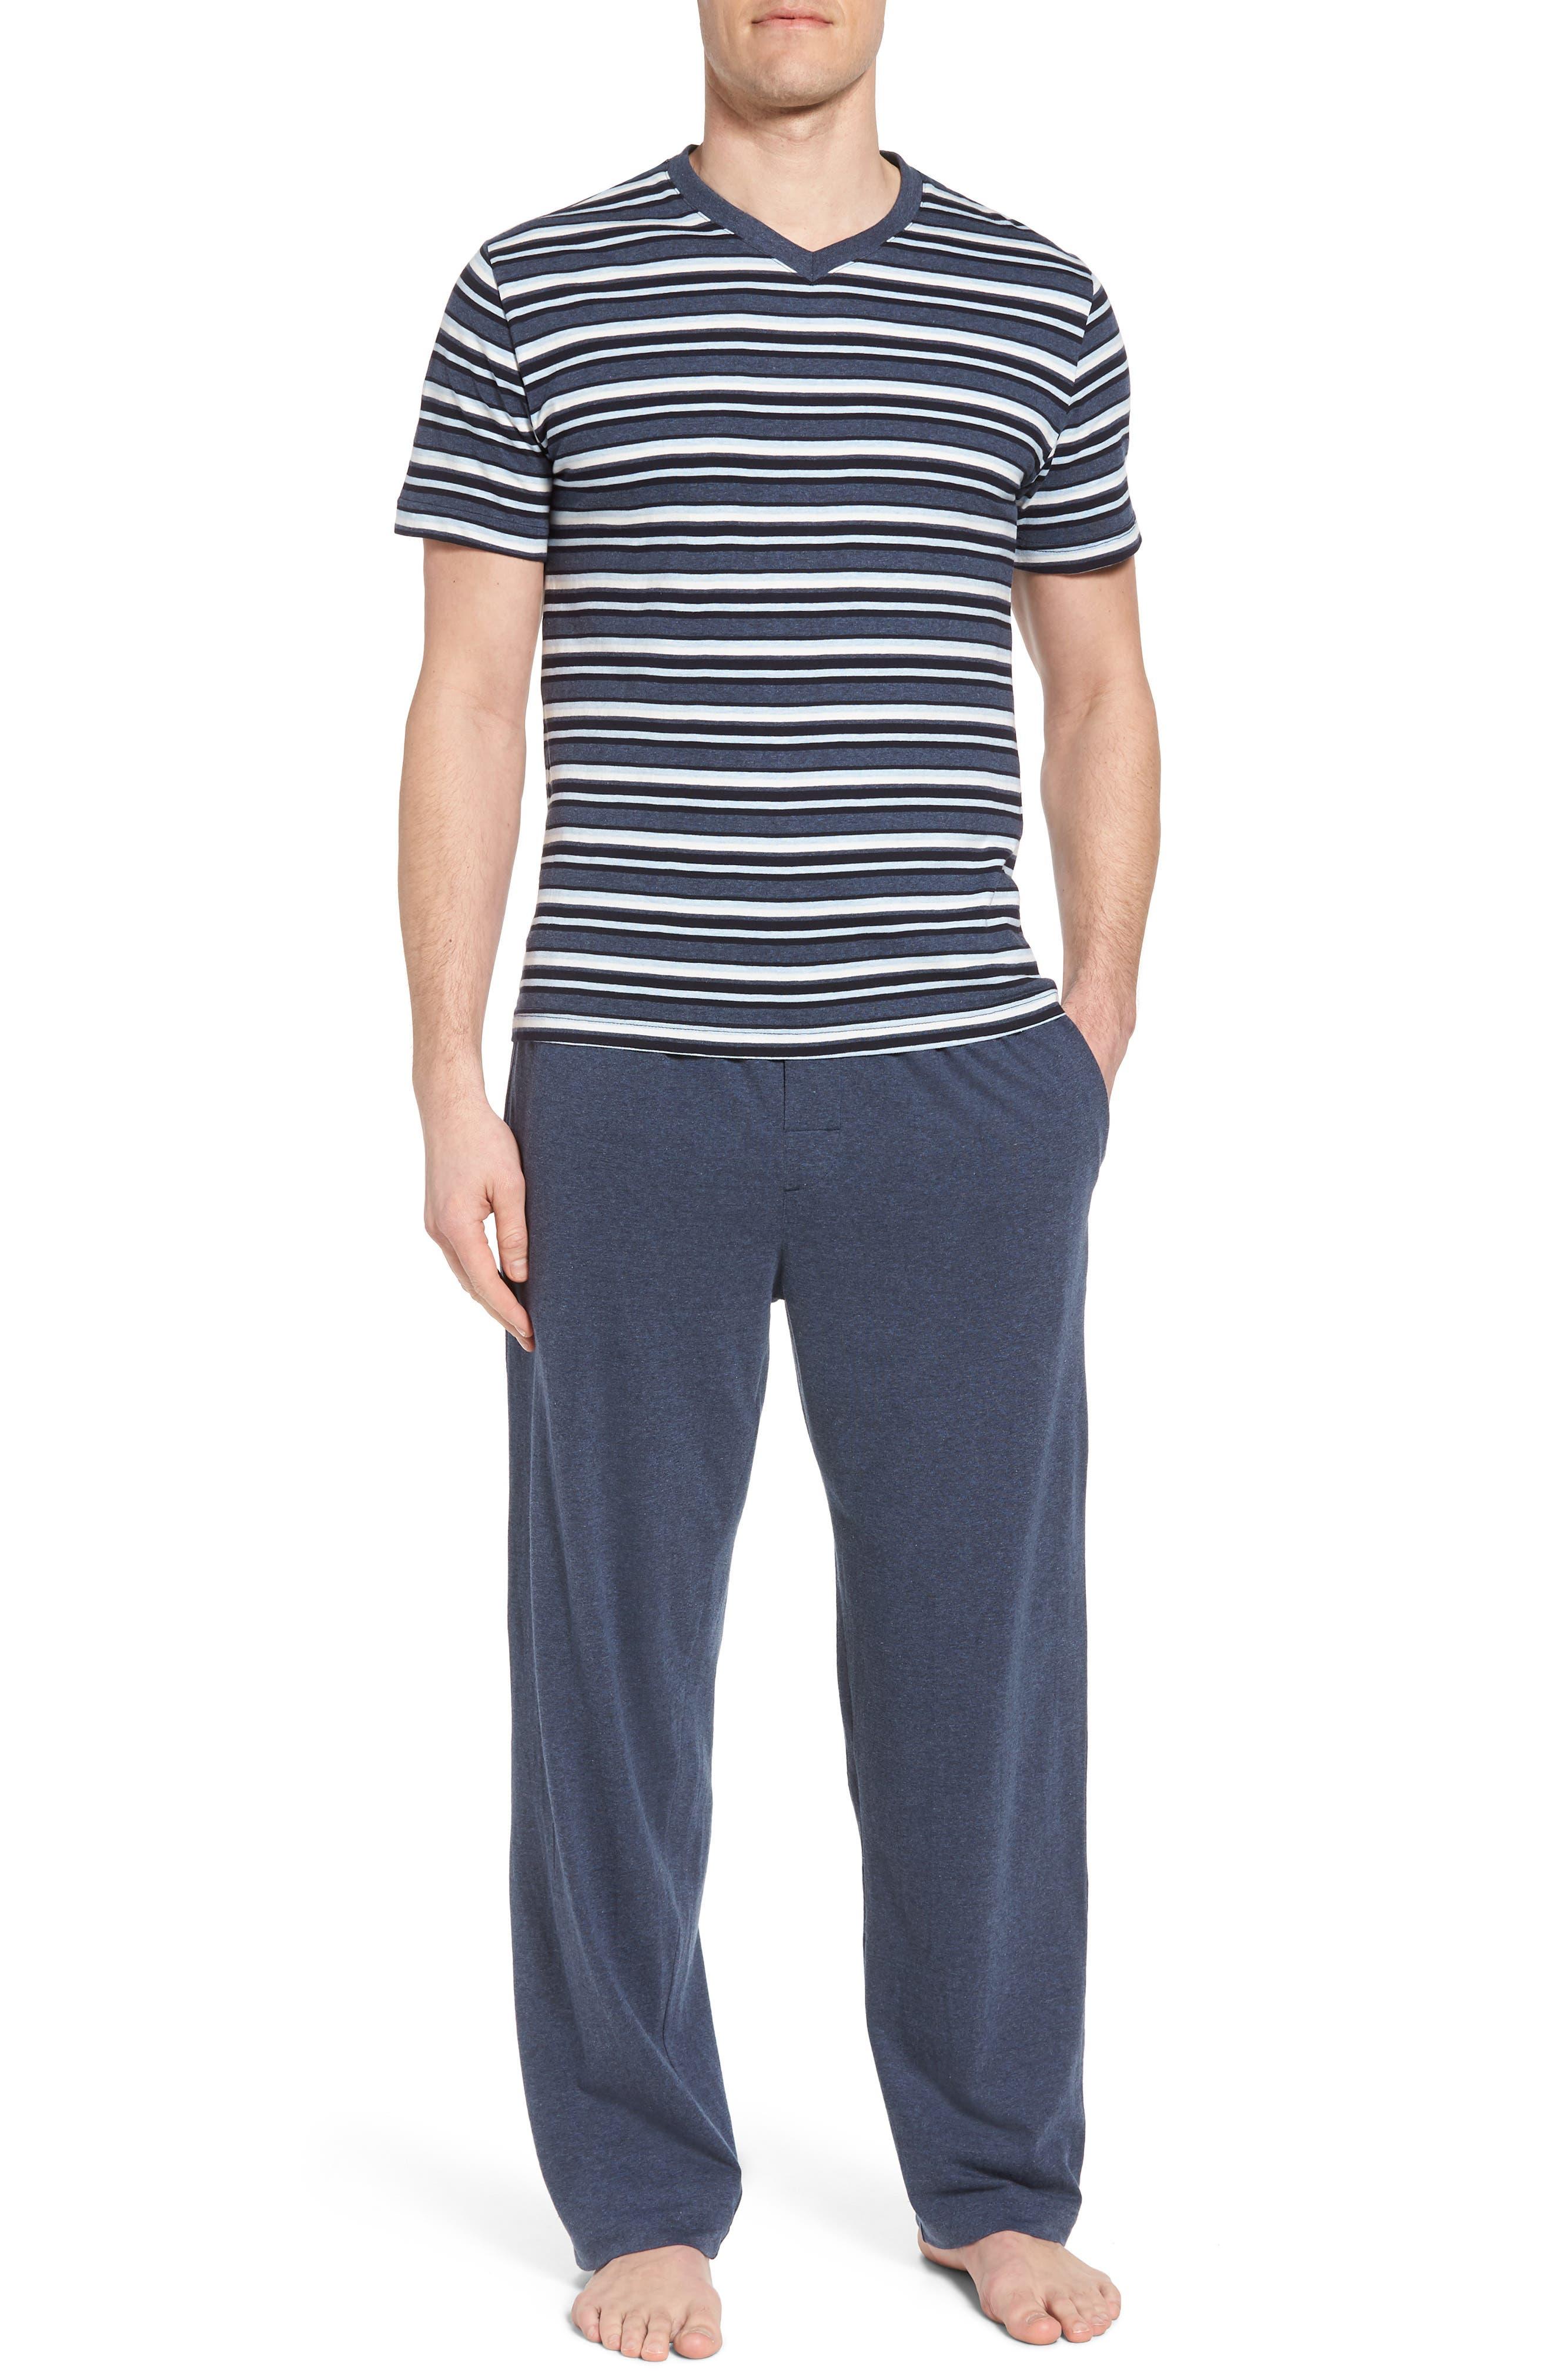 Majetic International Sleep On It Pajama Set,                             Main thumbnail 1, color,                             Alfresco Stripe